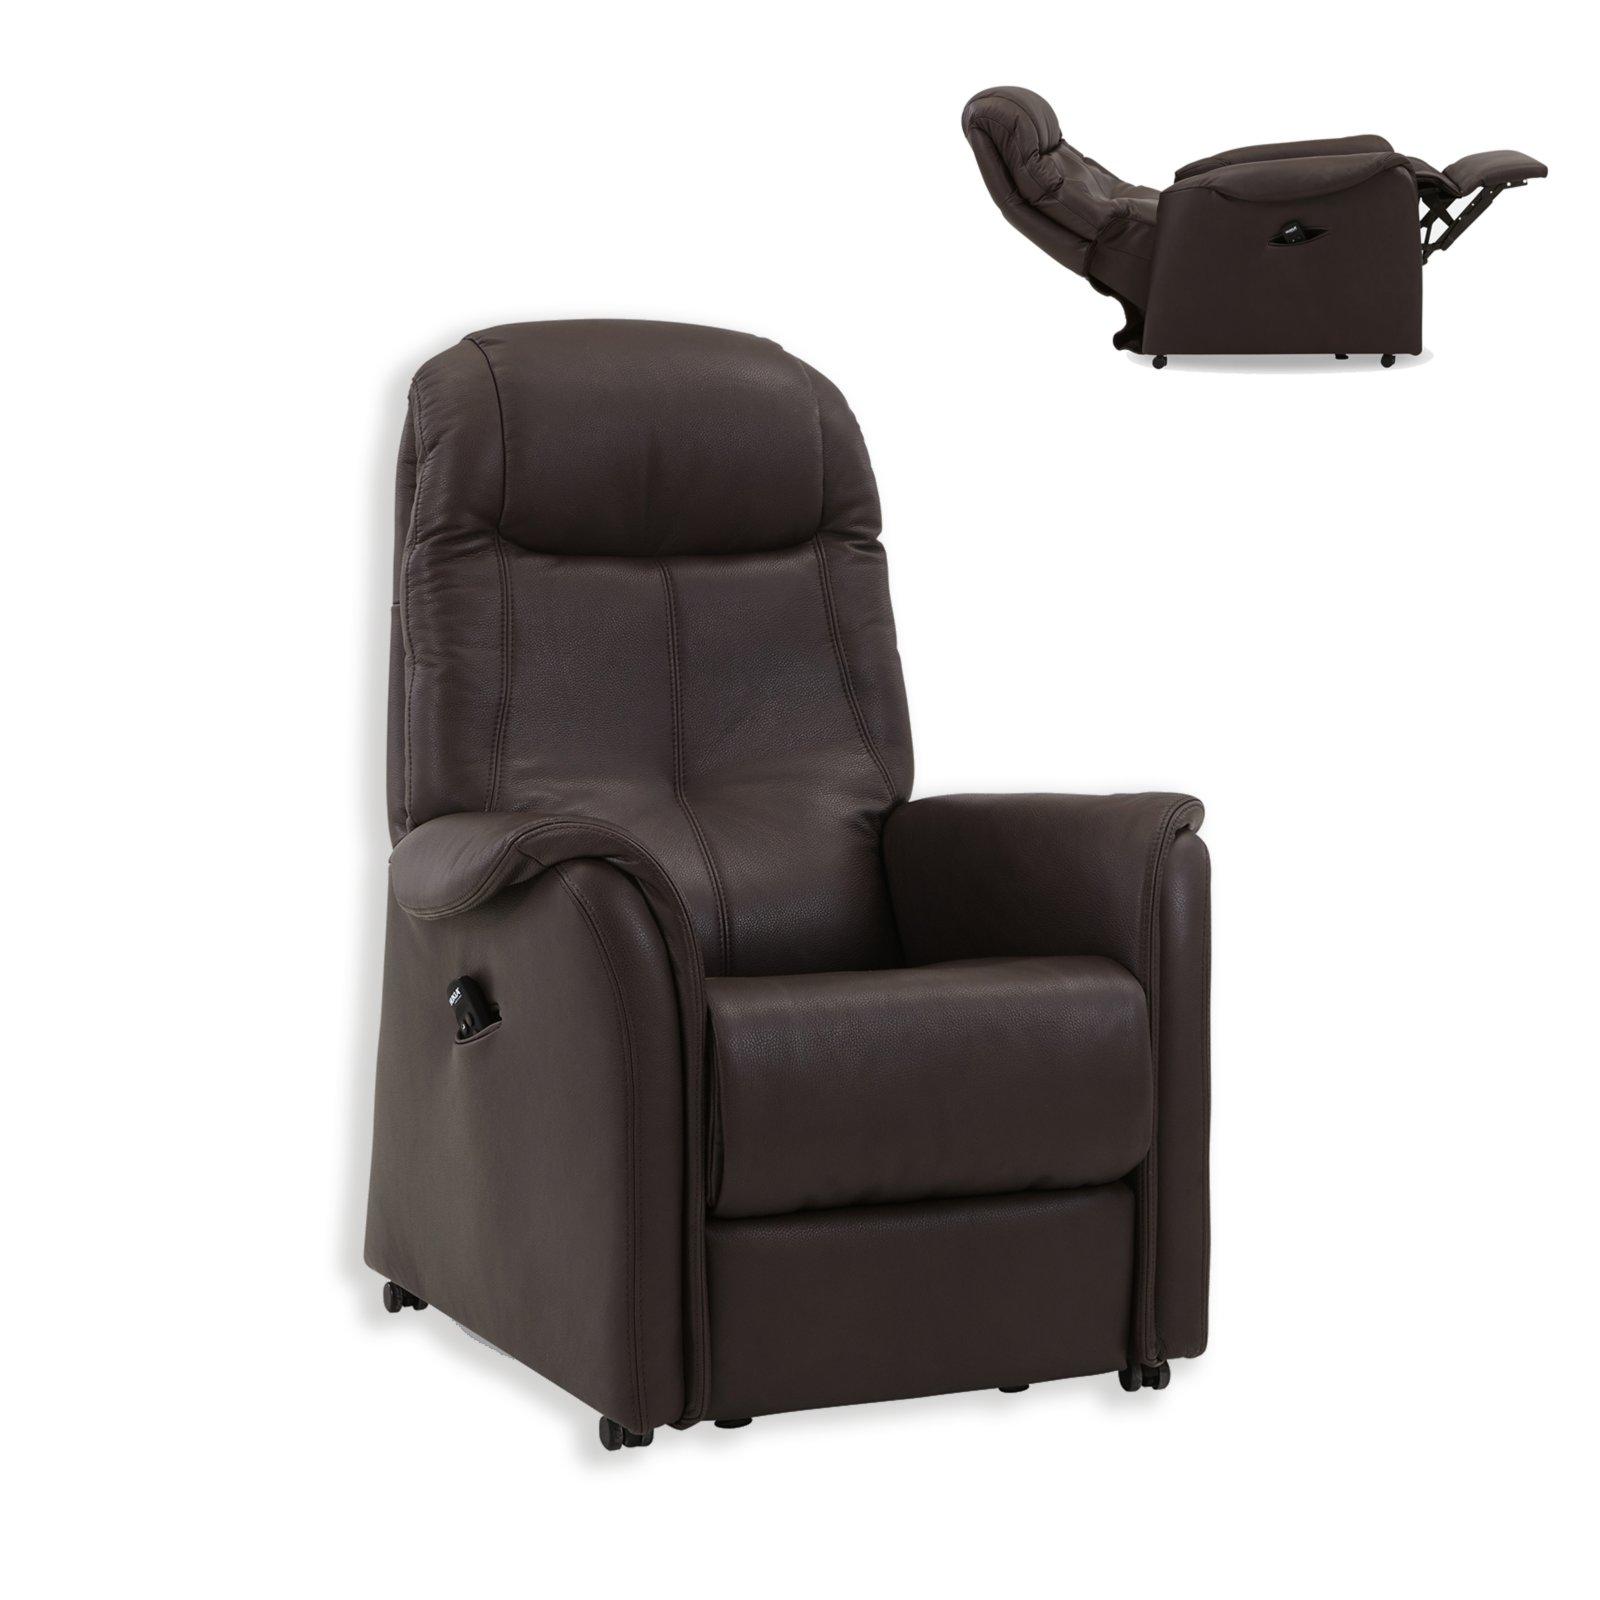 tv ledersessel dunkelbraun funktionen mit motor fernseh relaxsessel sessel hocker. Black Bedroom Furniture Sets. Home Design Ideas